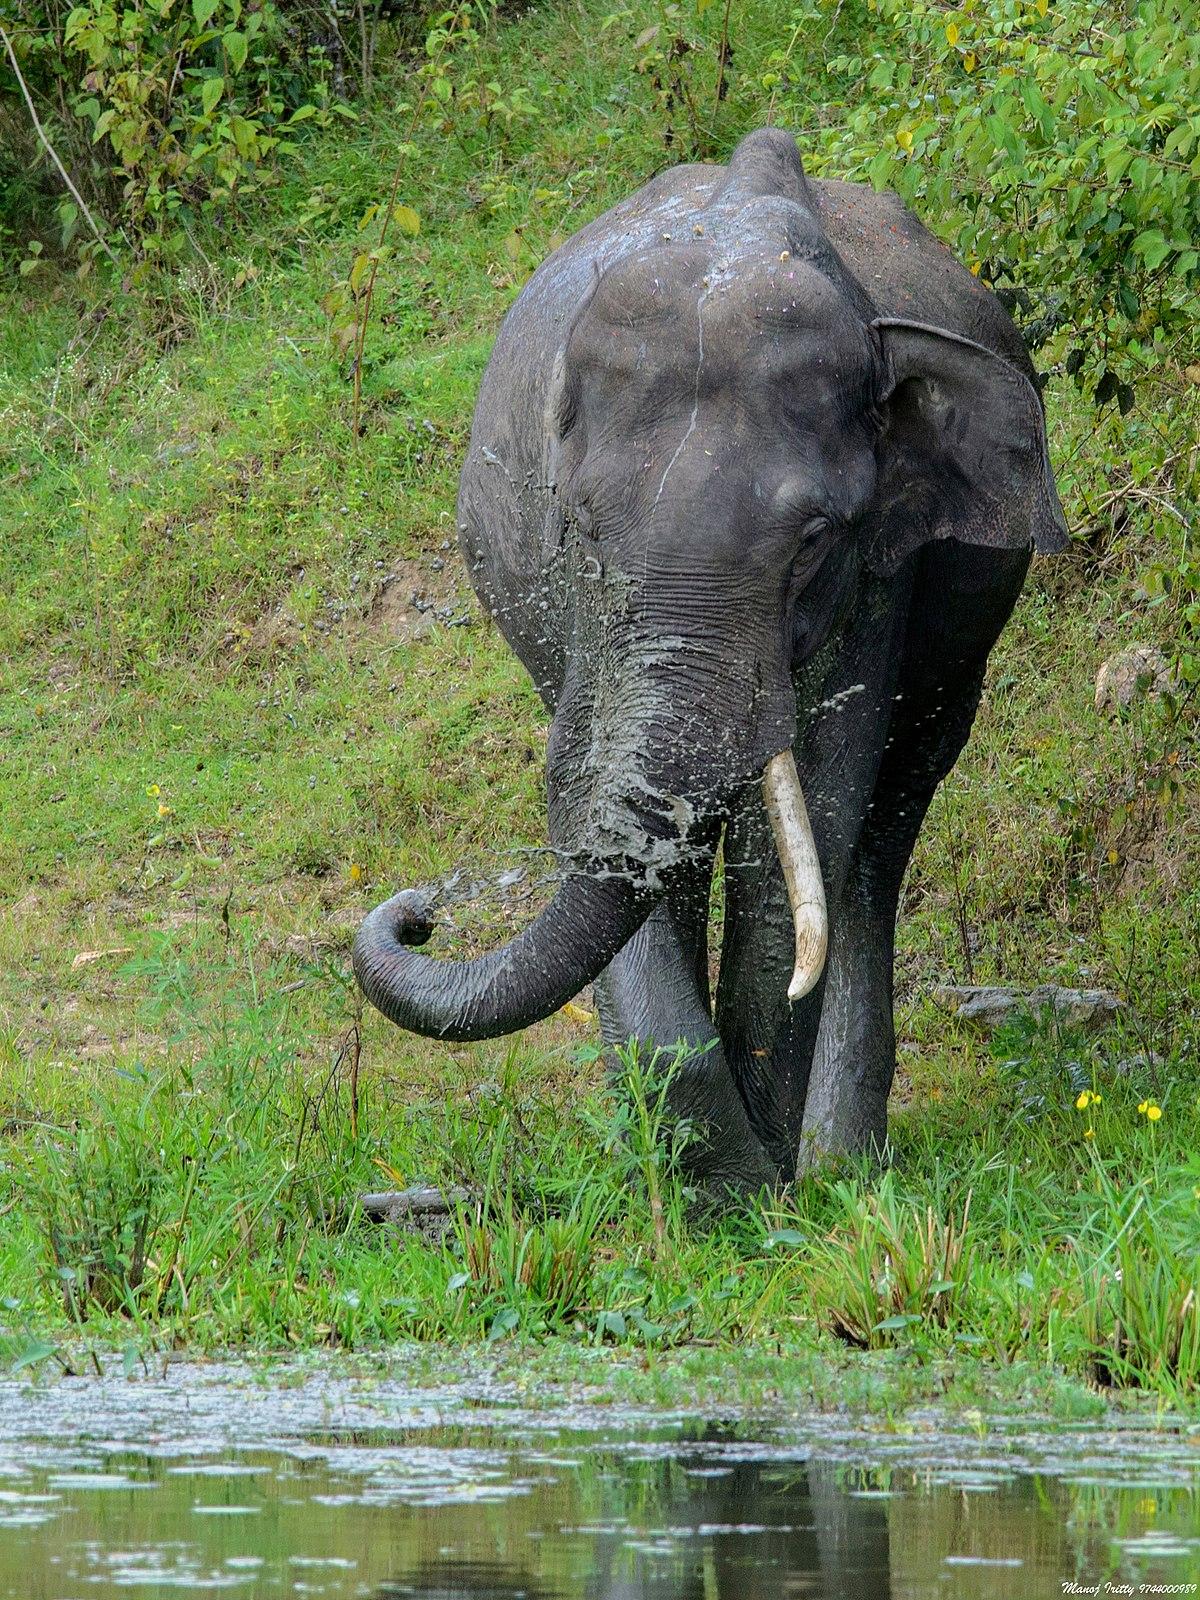 Borneo elephant - Wikipedia  Borneo elephant...